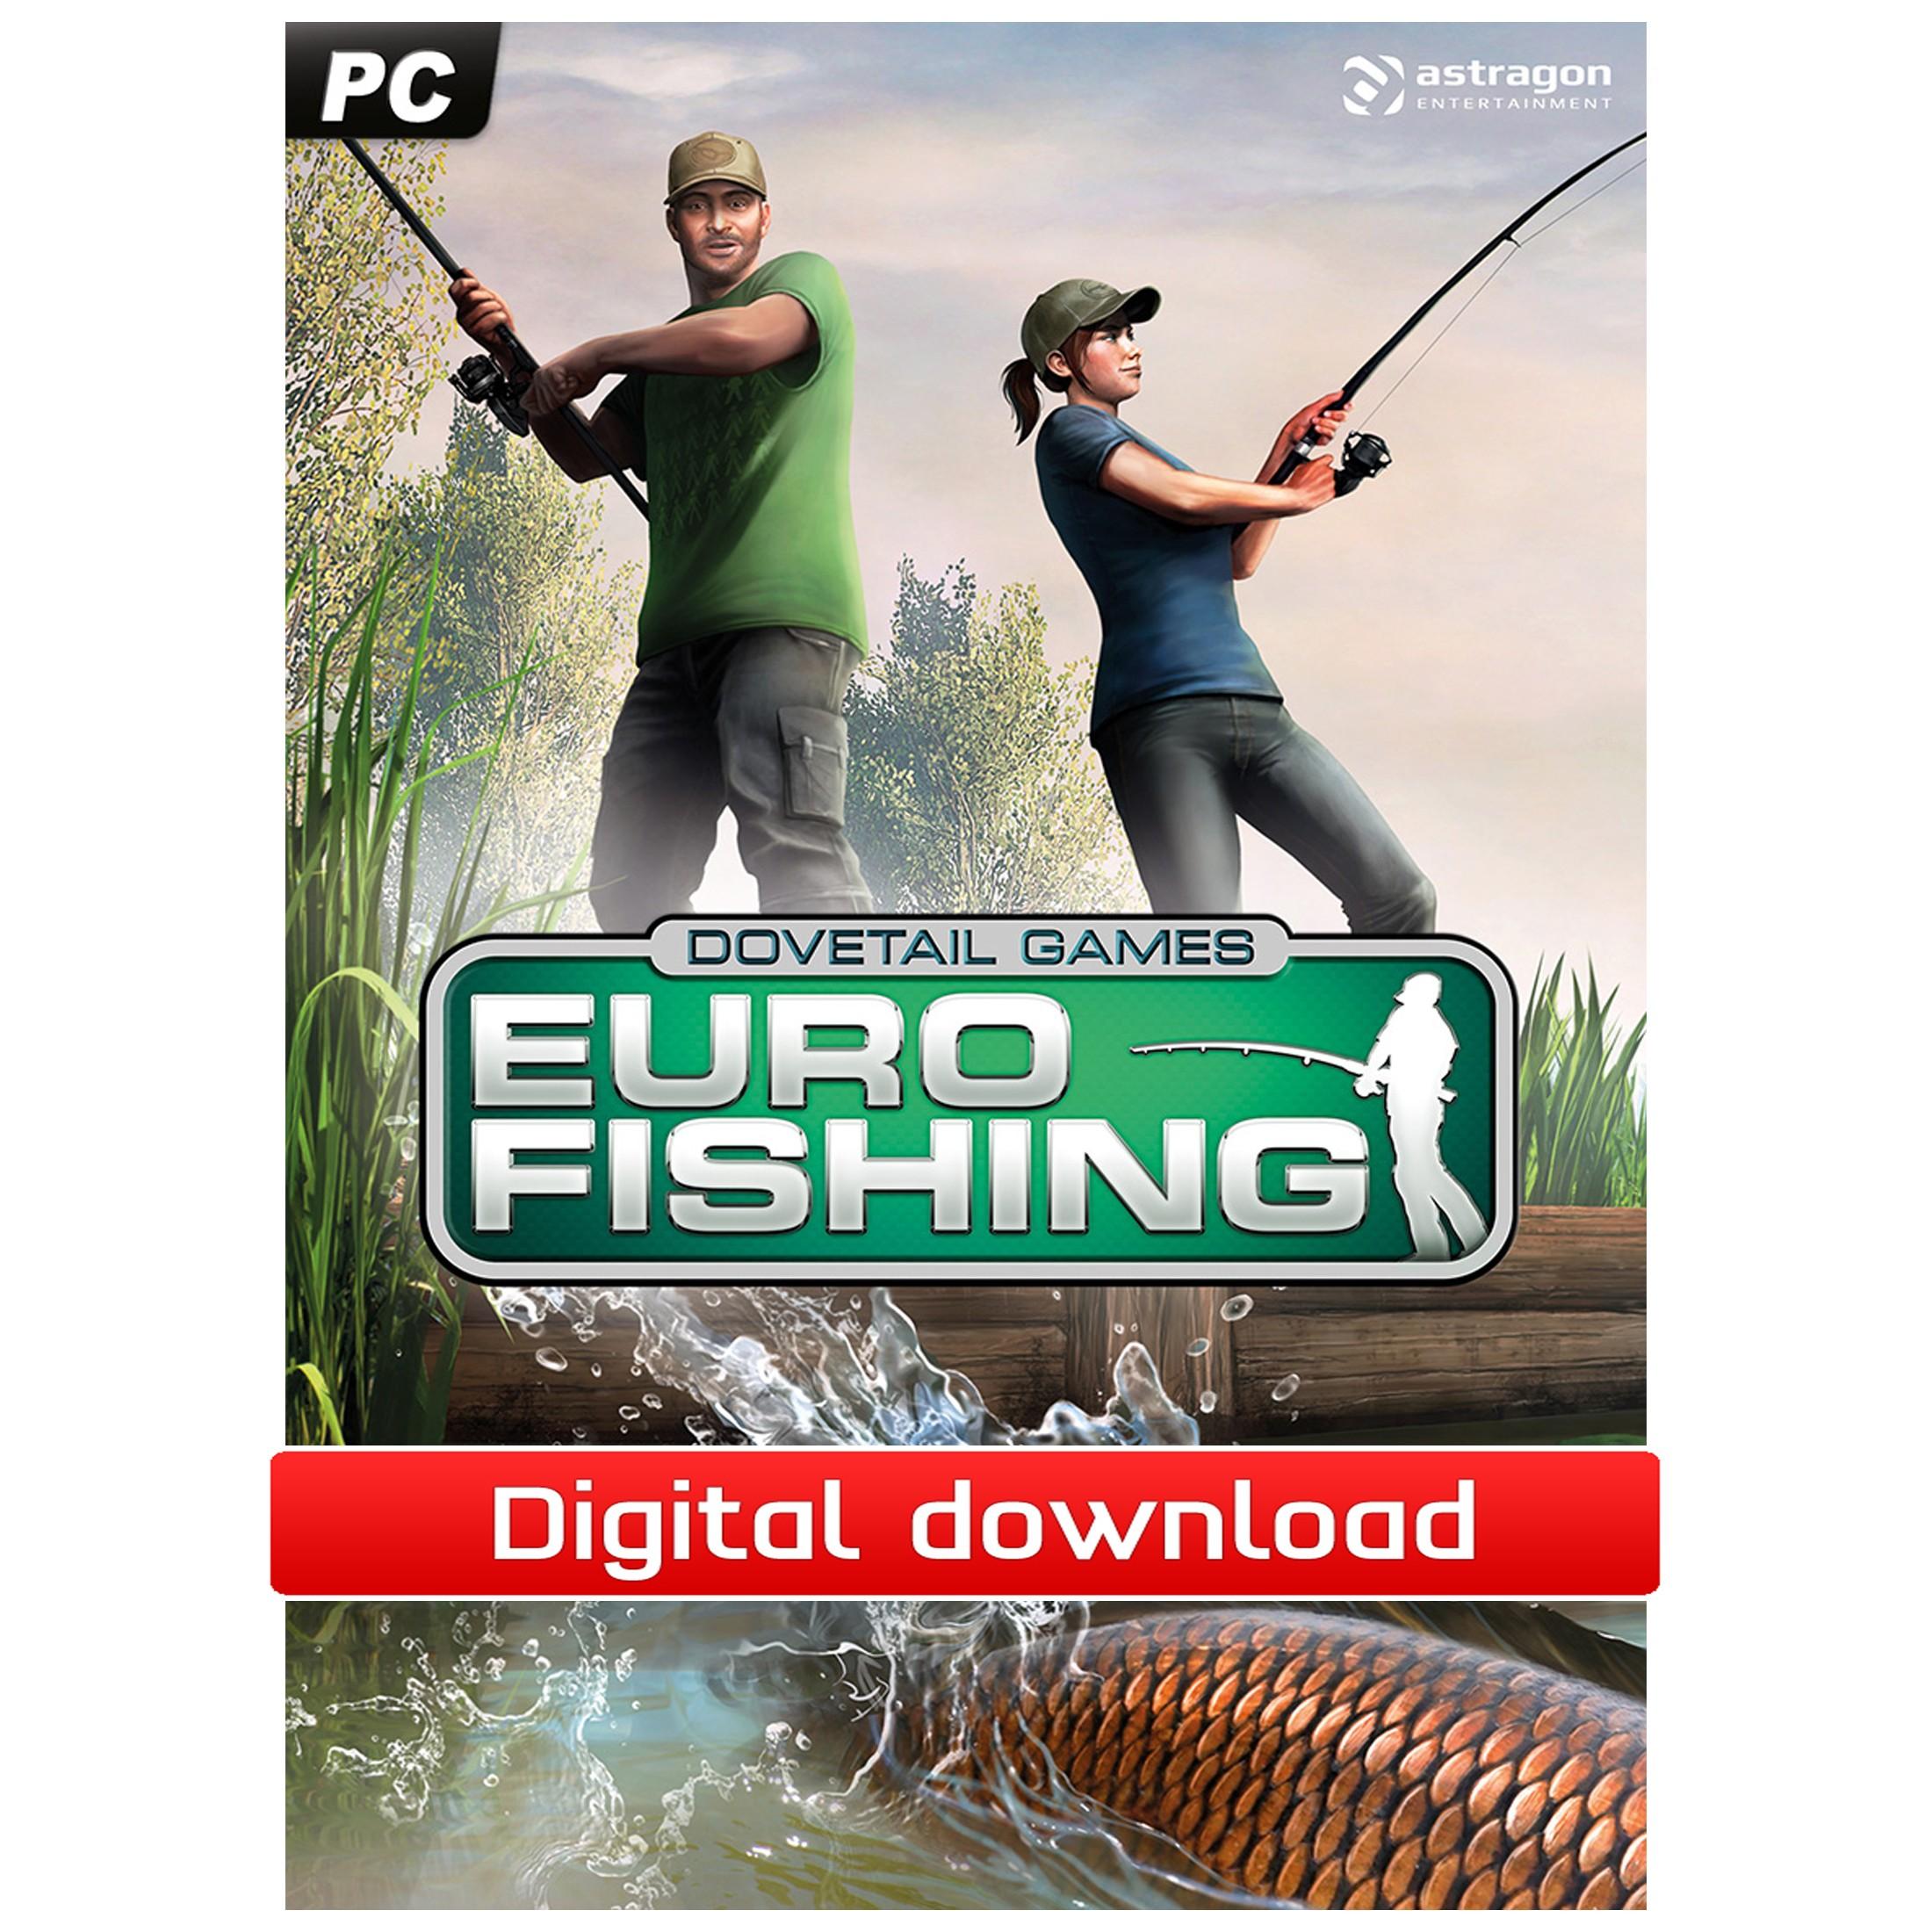 38387 : Dovetail Games Euro Fishing (PC nedlastning)